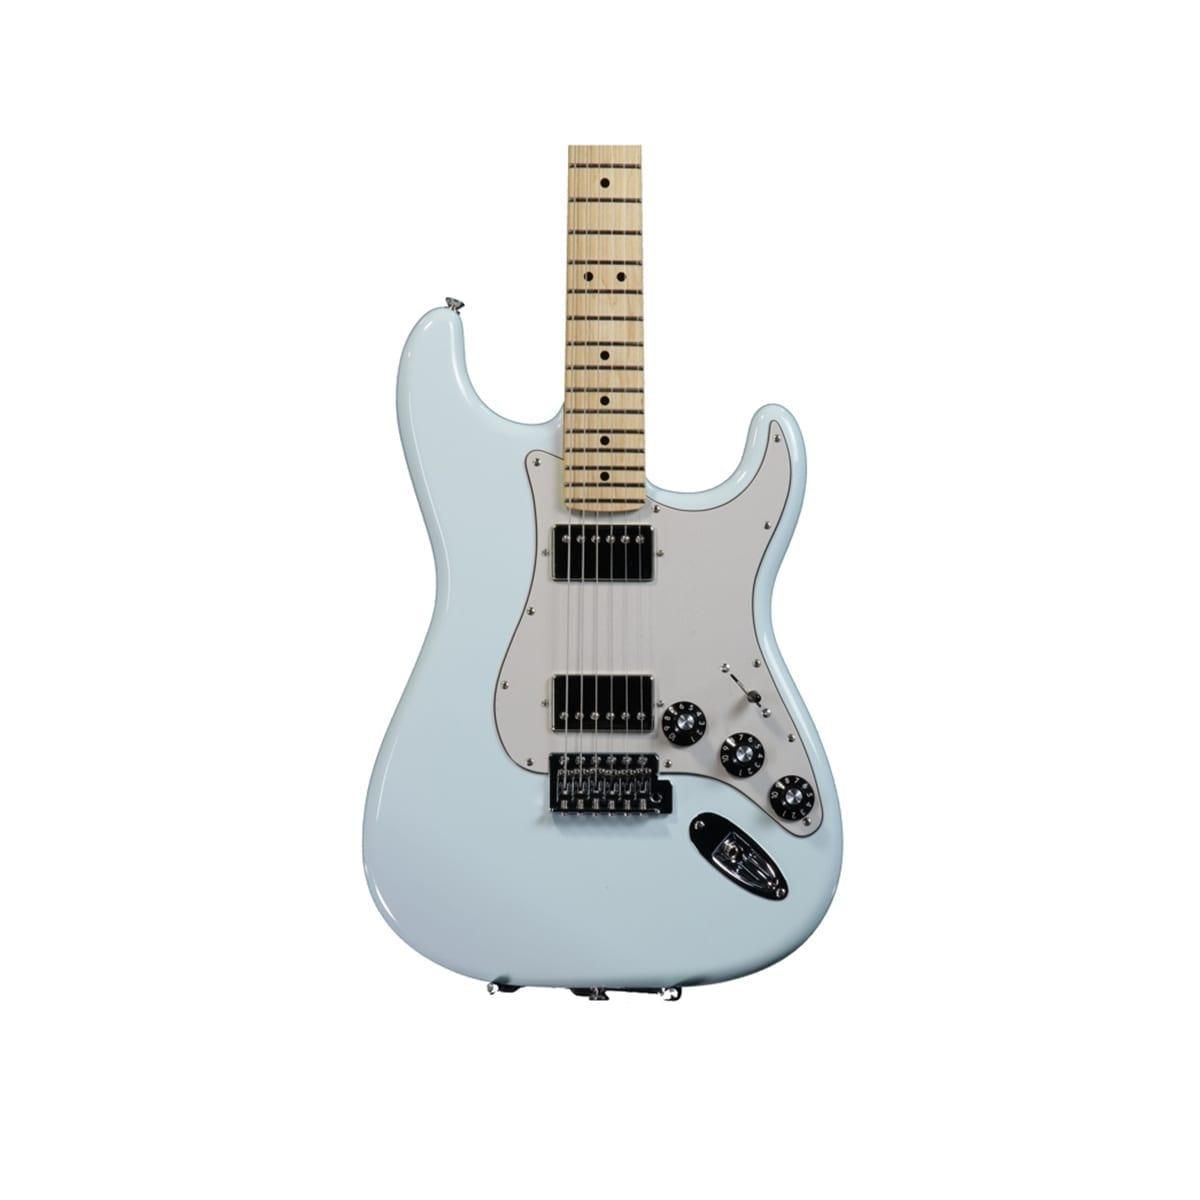 Fender Blacktop Stratocaster - Sonic Blue